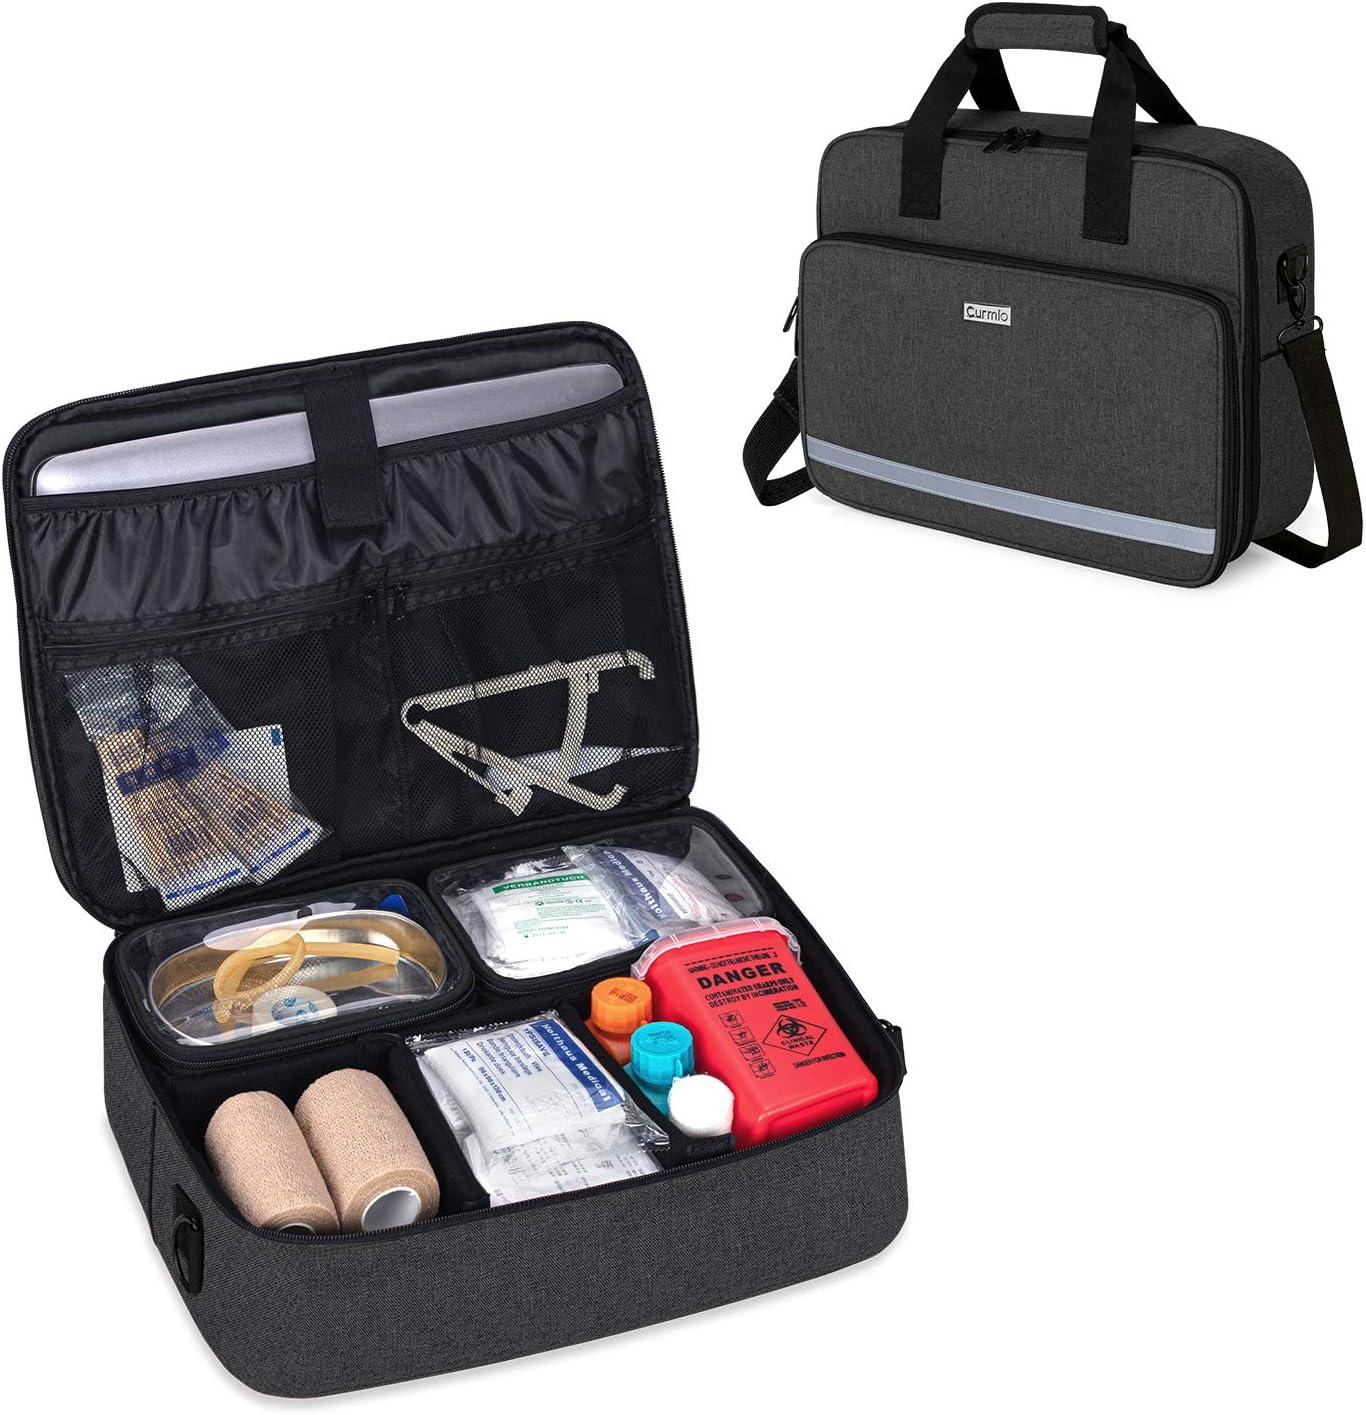 CURMIO Nursing Bags for Nurses Home Health, Small Medical Supplies Bag with 2 Detachable Transparent Pouches for Home Visits, Health Care, Hospice, Black